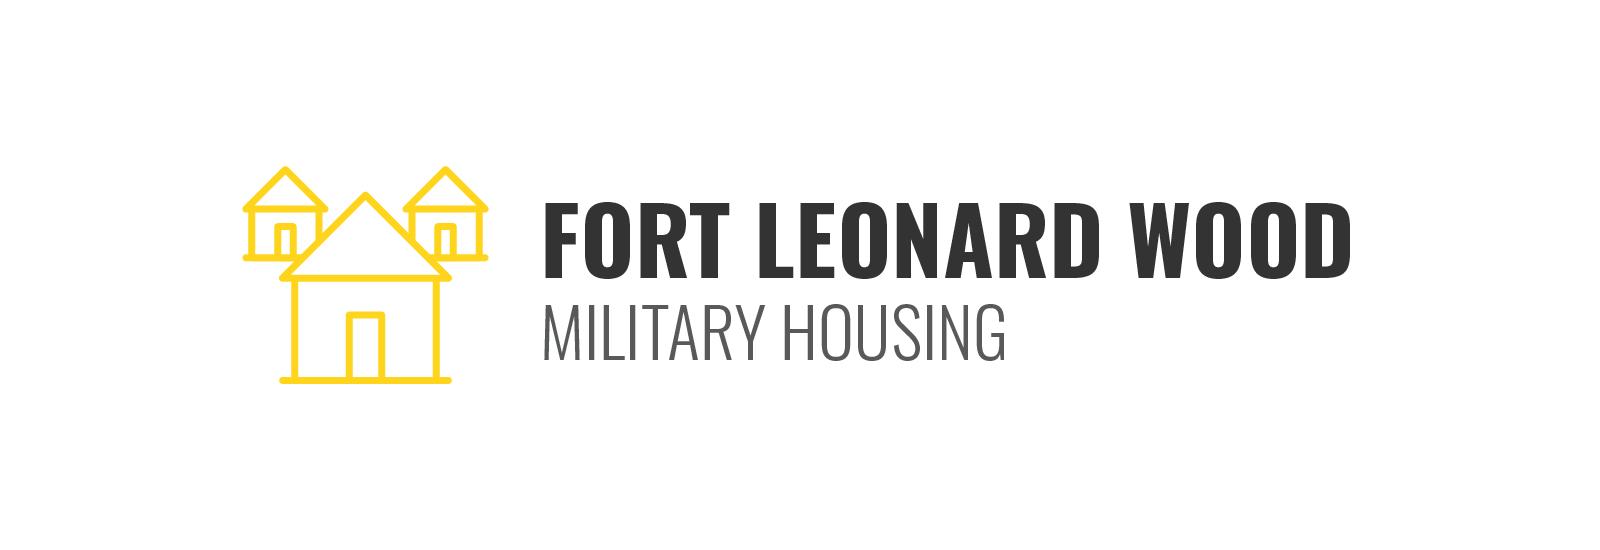 Fort Leonard Wood Military Housing